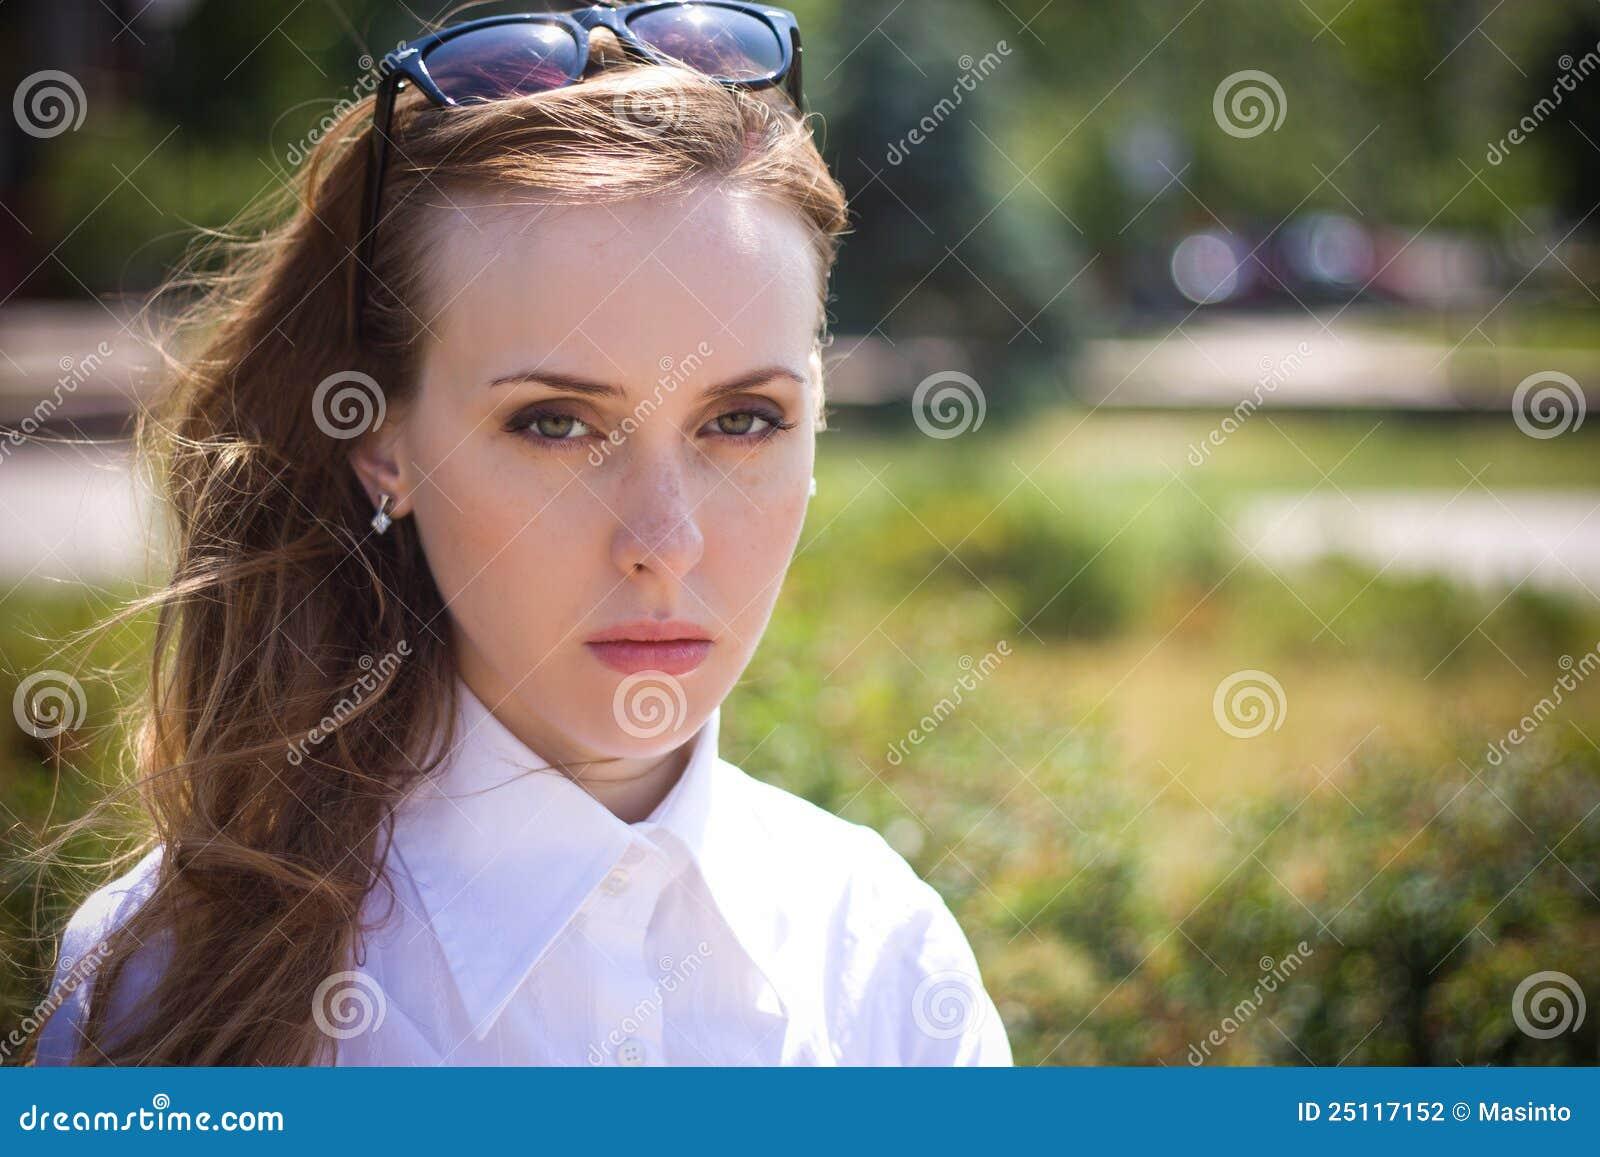 Pretty sad young woman